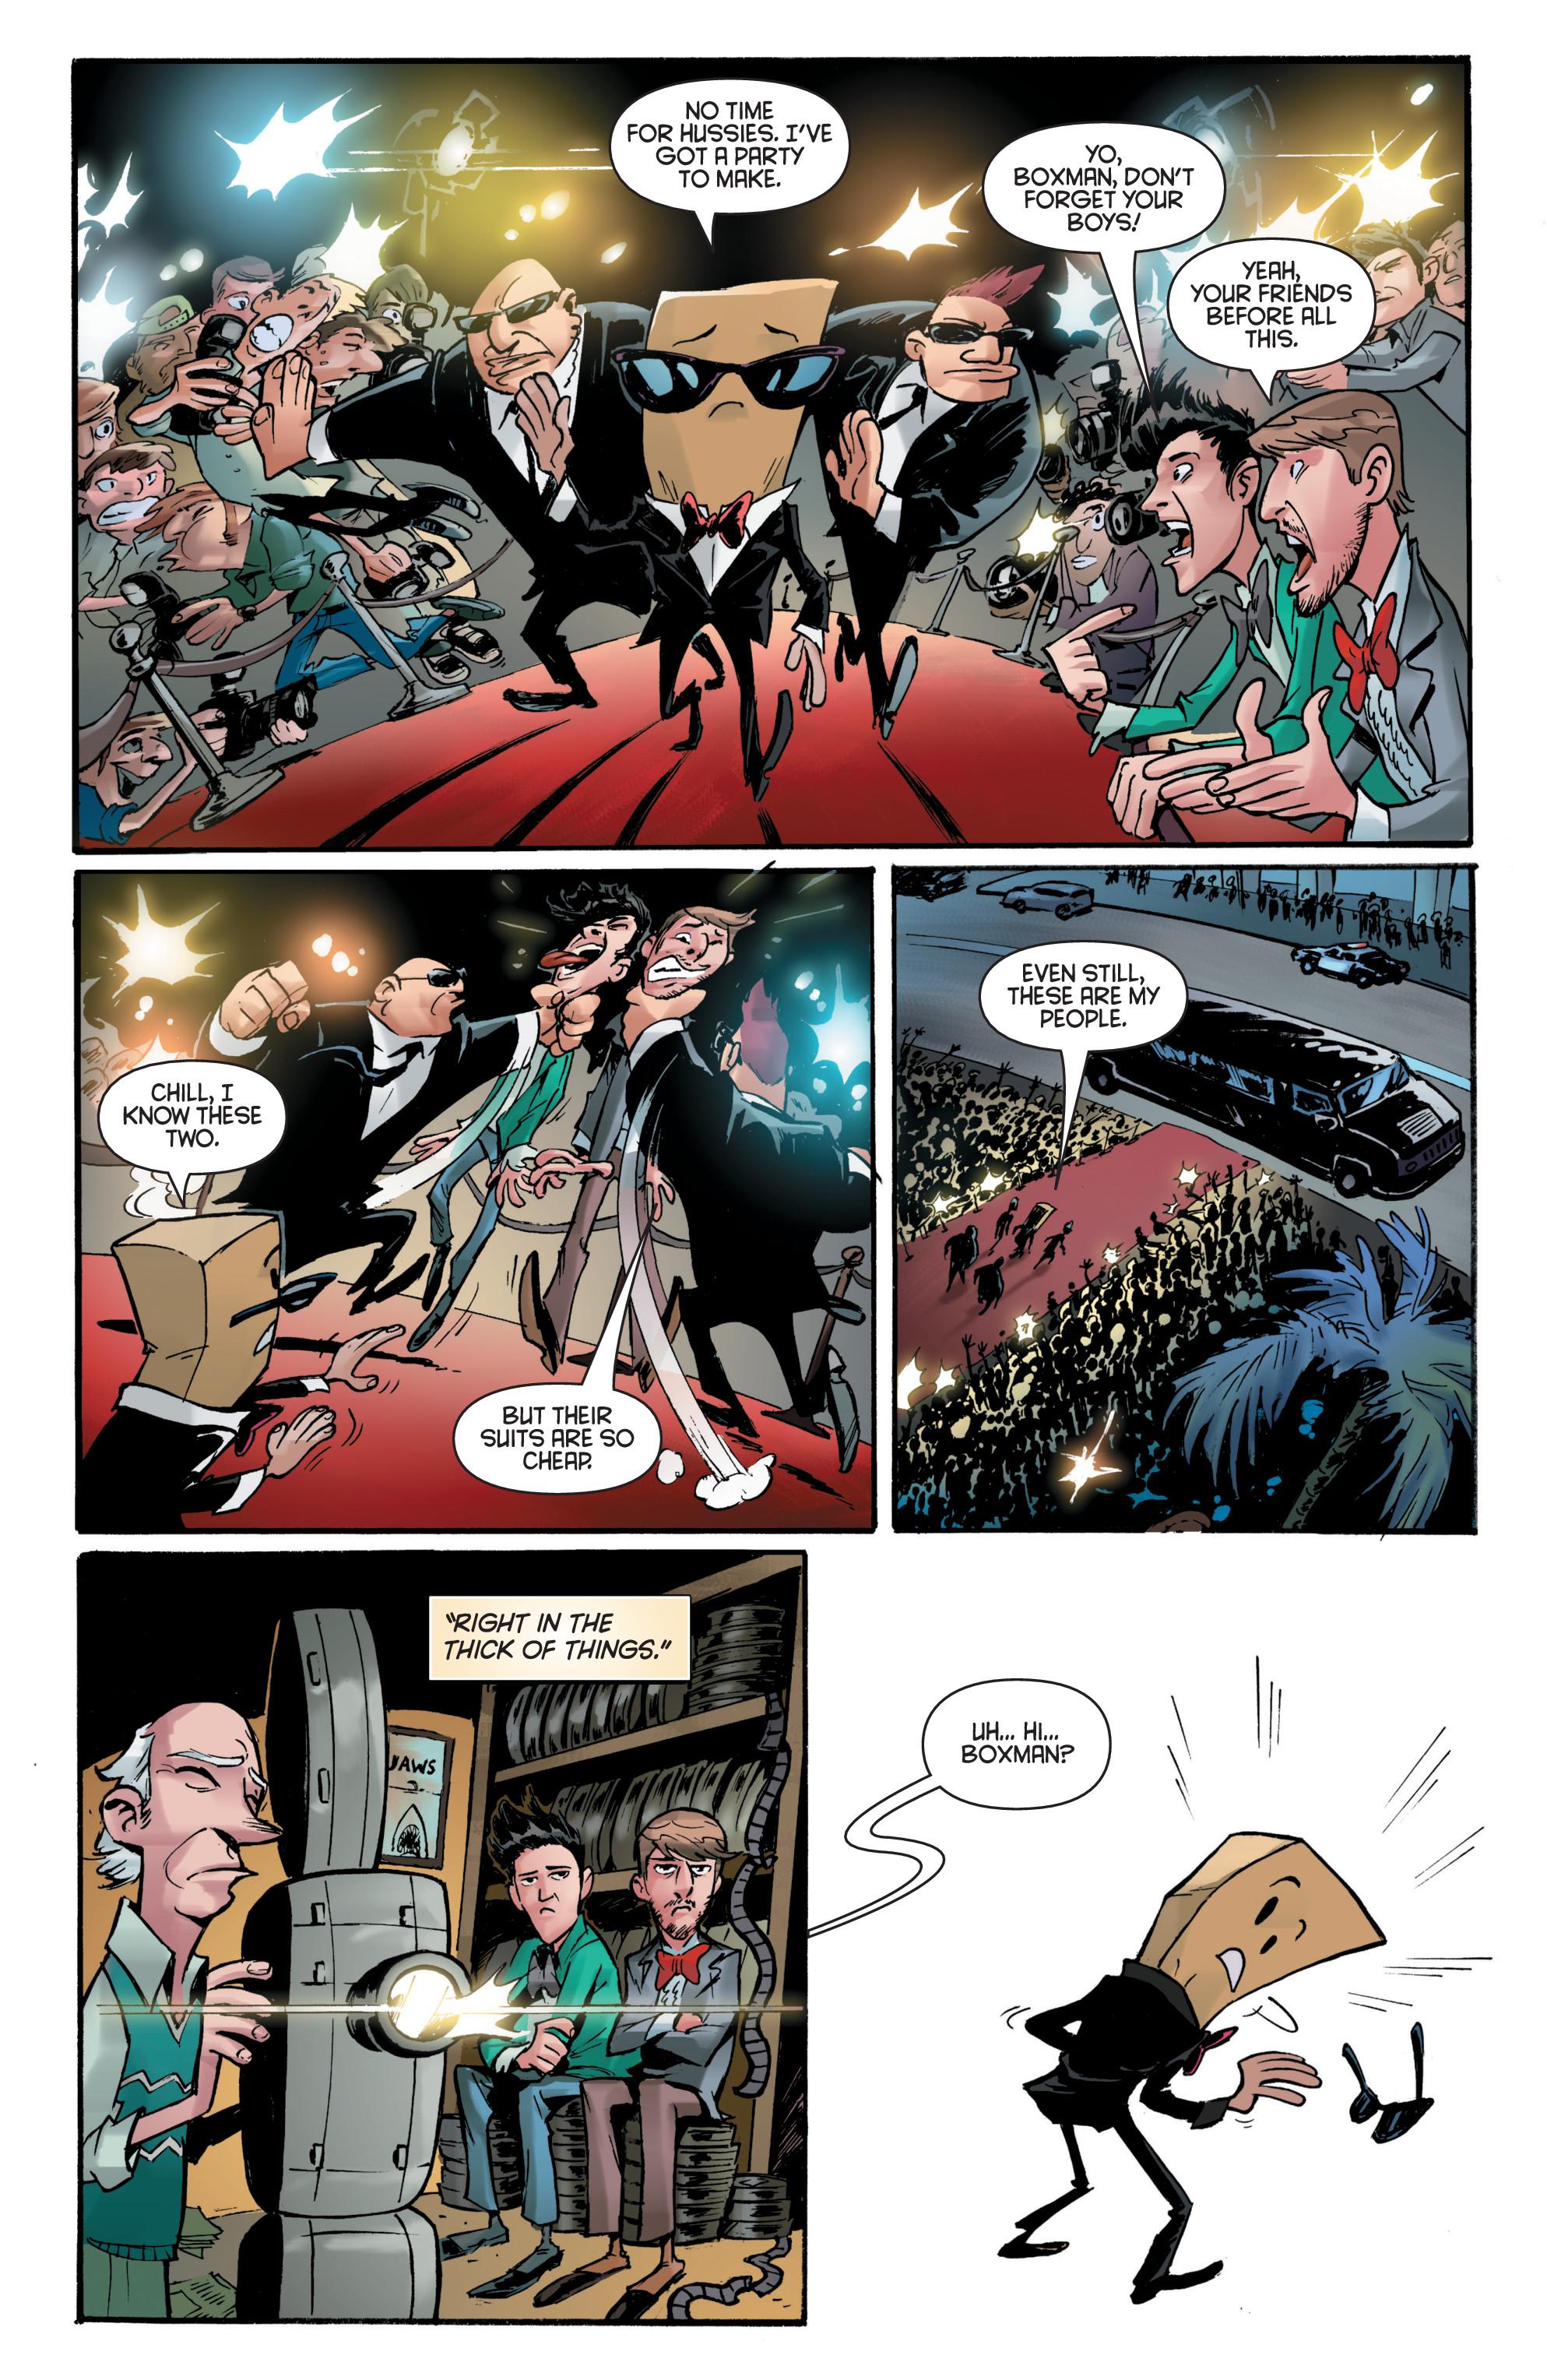 Read online Smosh comic -  Issue #5 - 5